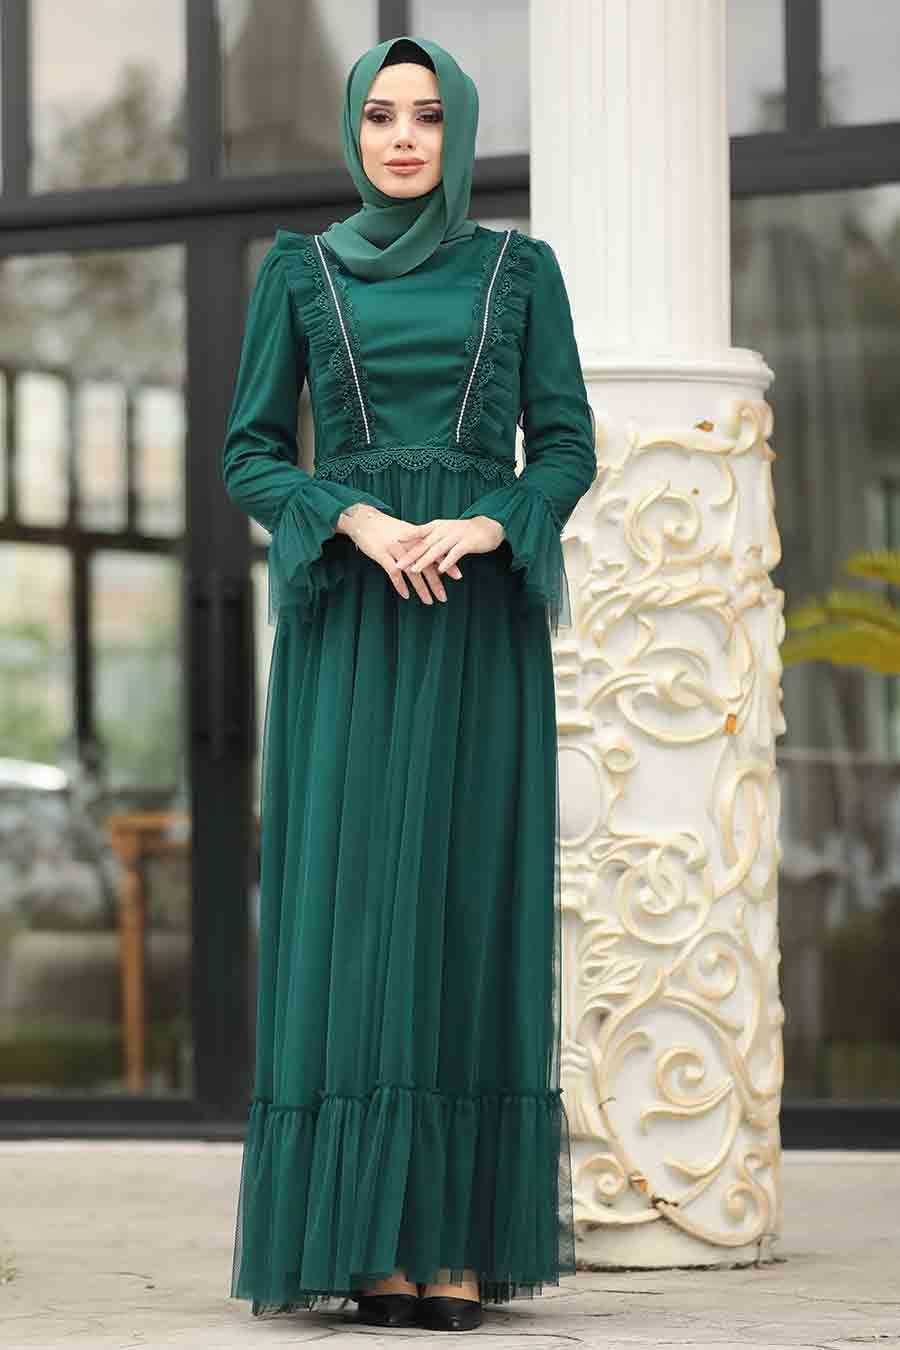 Green Hijab Evening Dress 38980Y